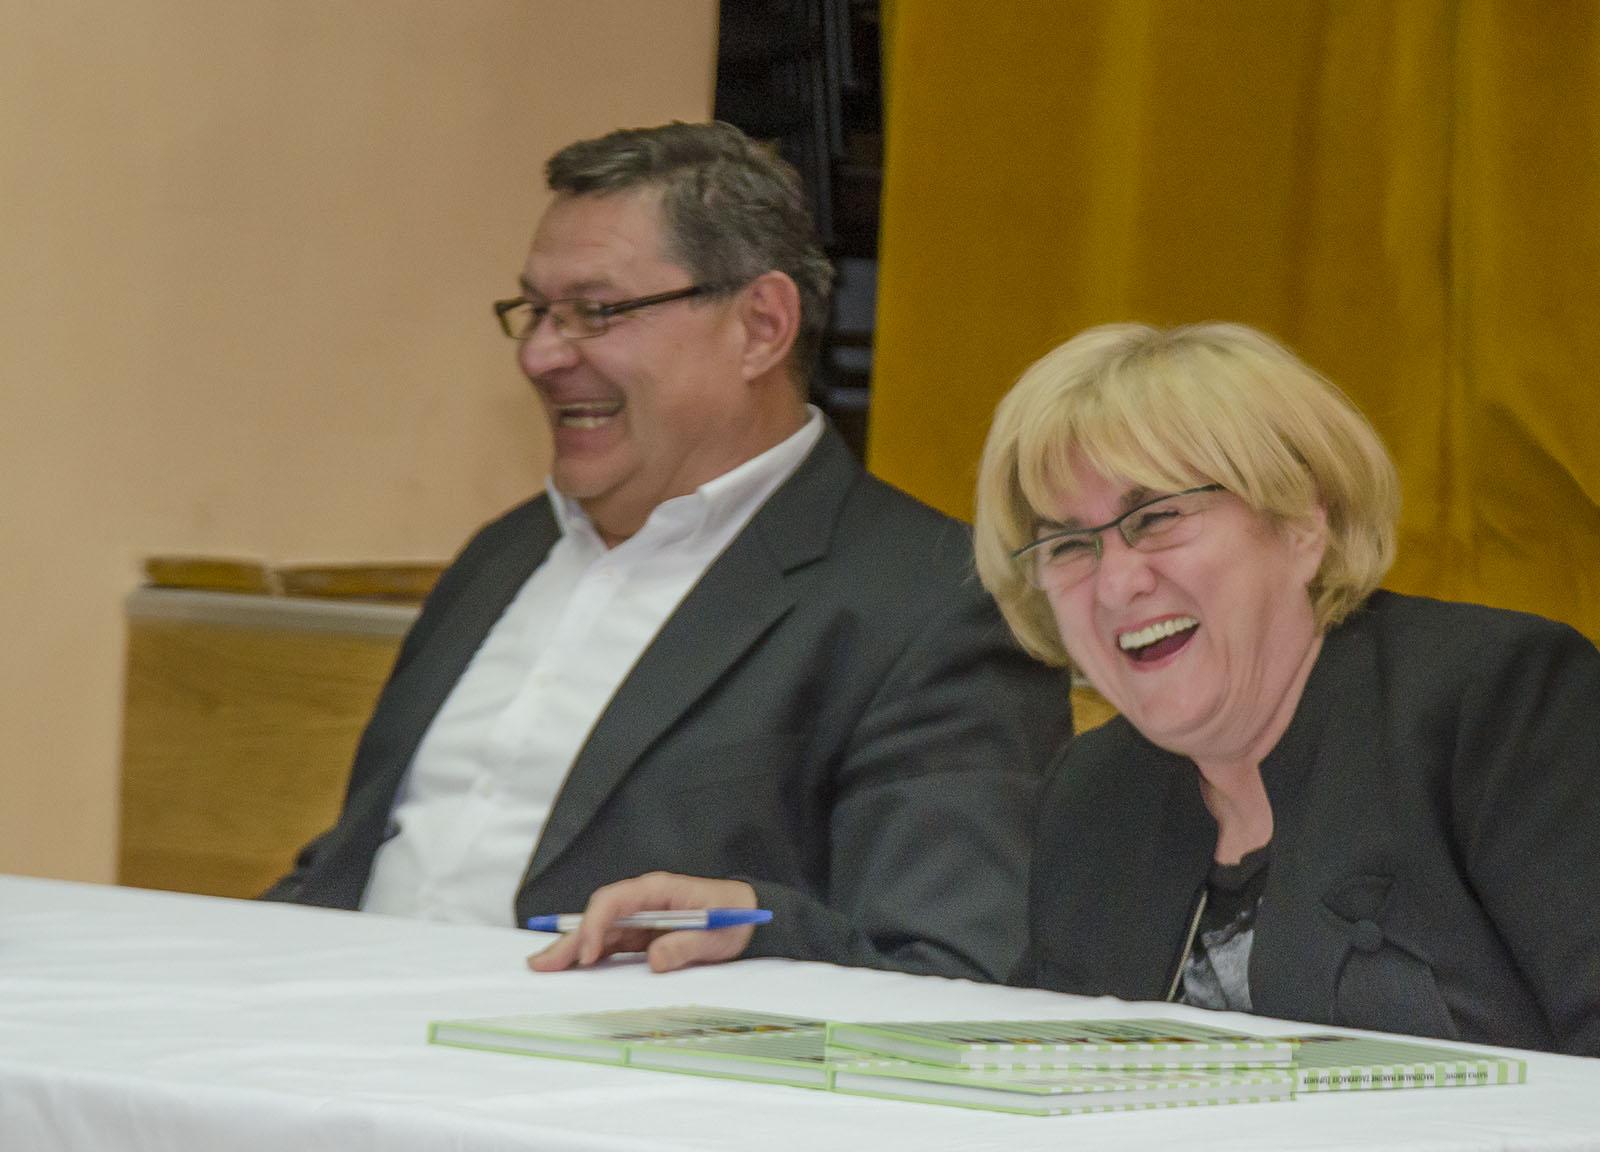 promocija knjige nacionalne manjine zagrebacke zupanije - slavica sarovic